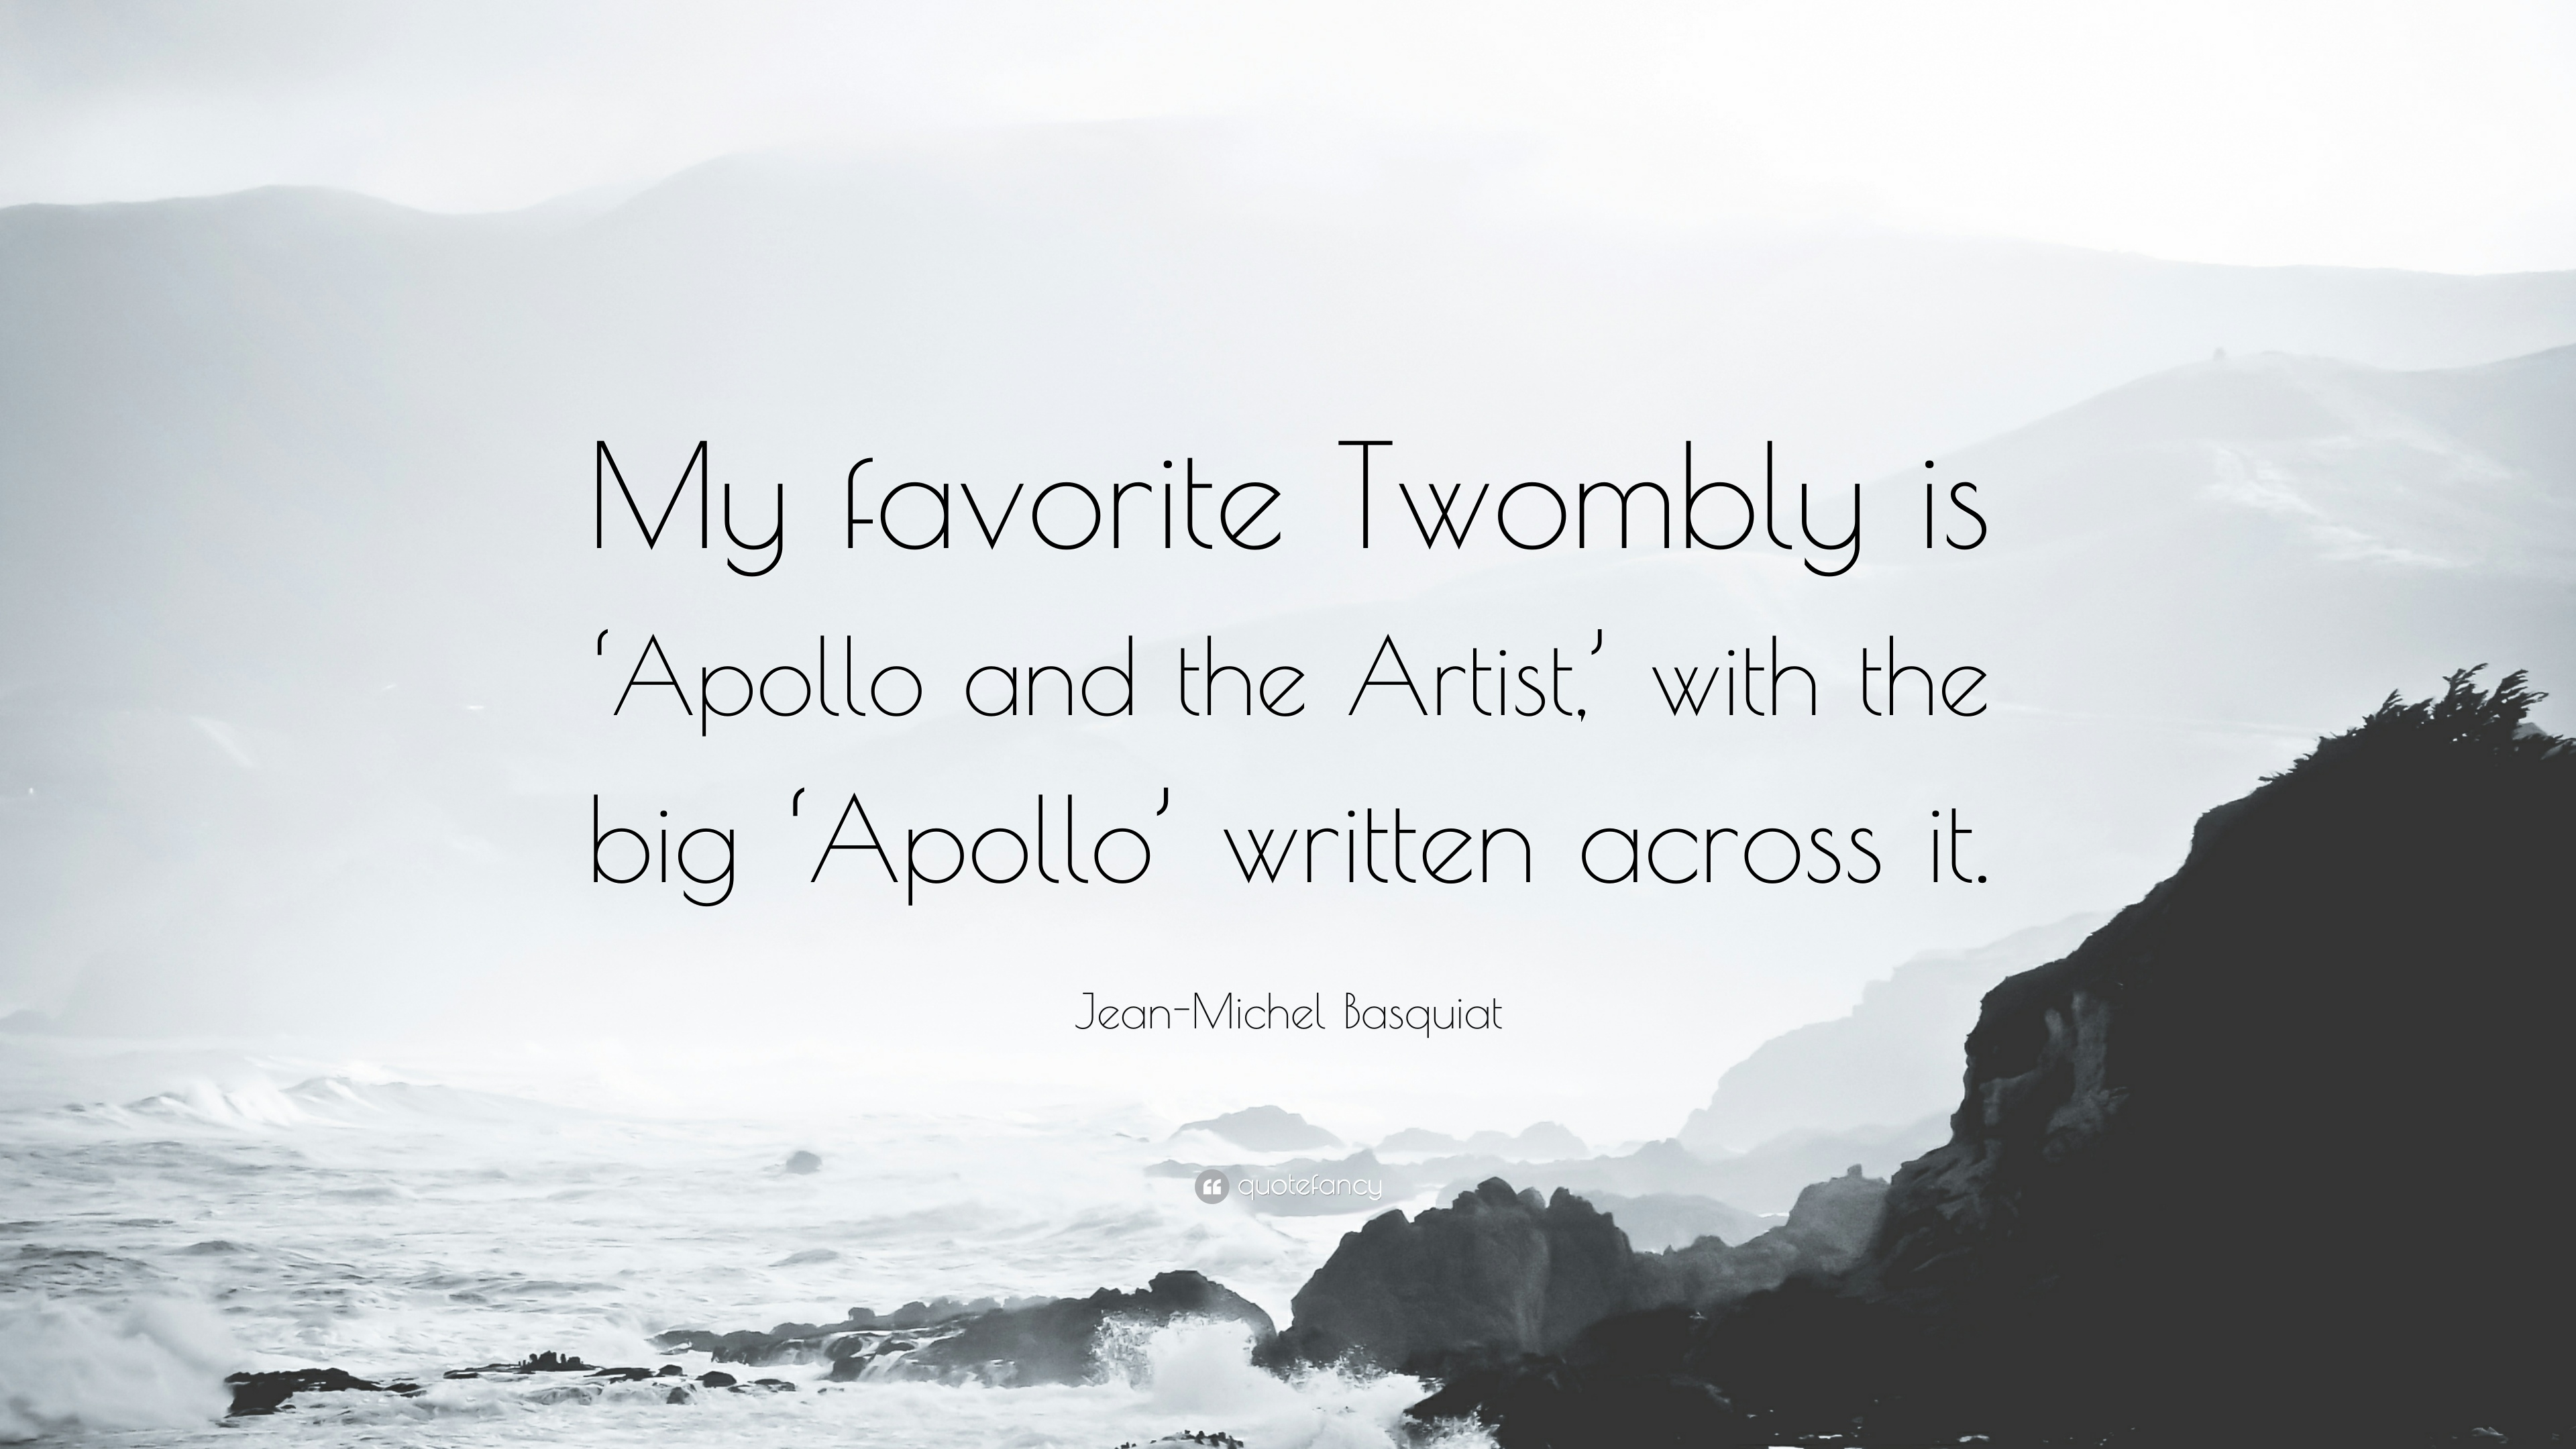 Apollo 13 Quotes Top jean-michel basquiat quotes (16 wallpapers) - quotefancy